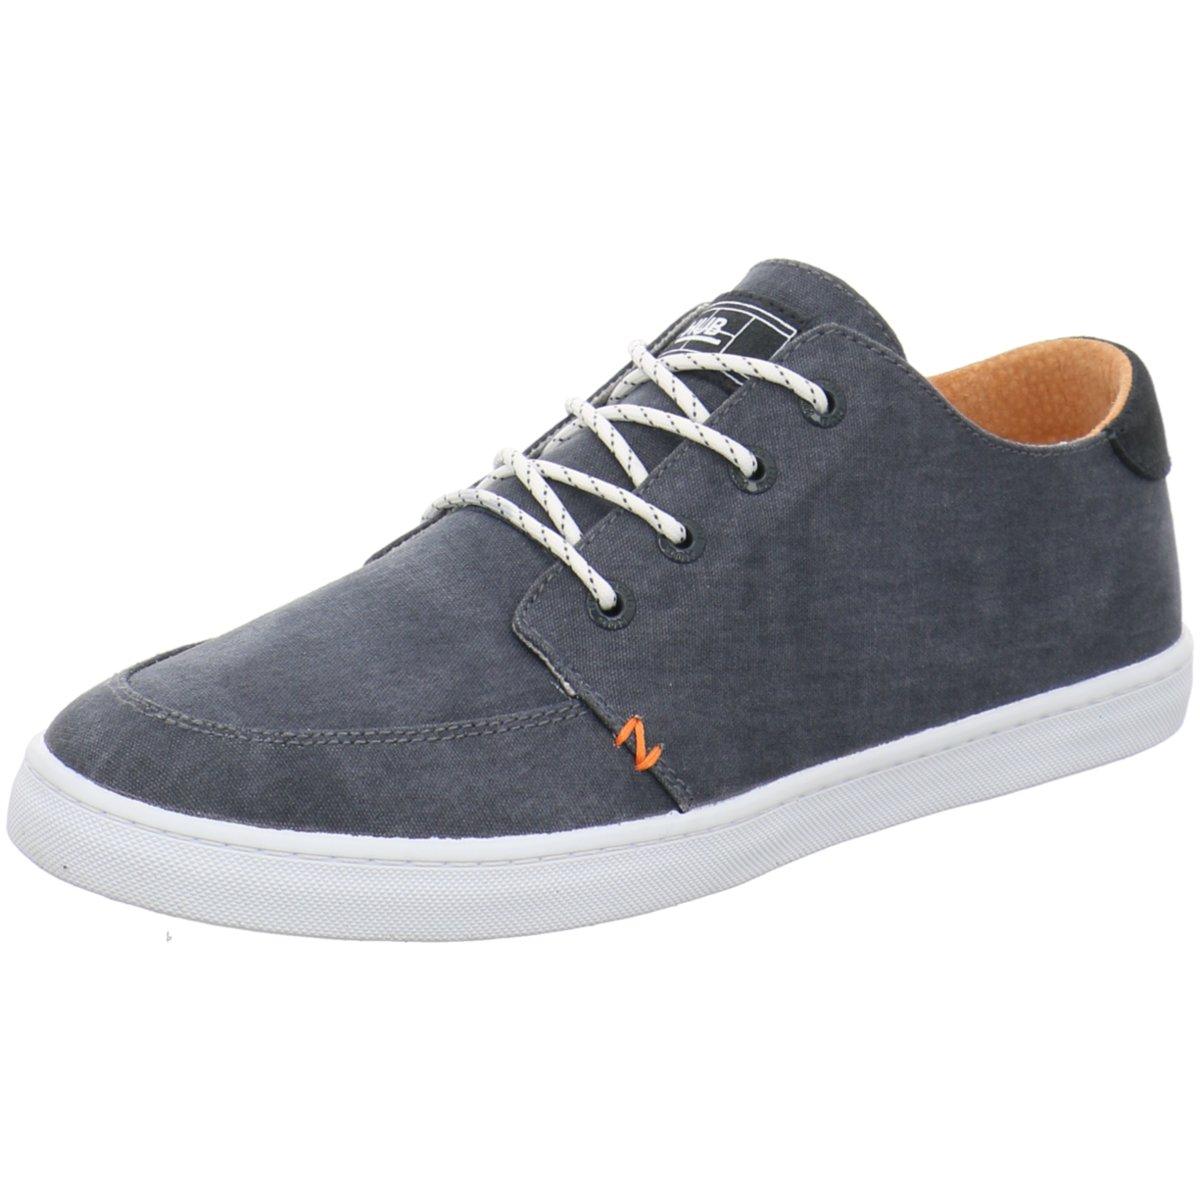 NEU Hub Herren M27-01C06-C01-004 Sneaker Sneaker - Hub M27-01C06-C01-004 Herren blau 247596 27063b